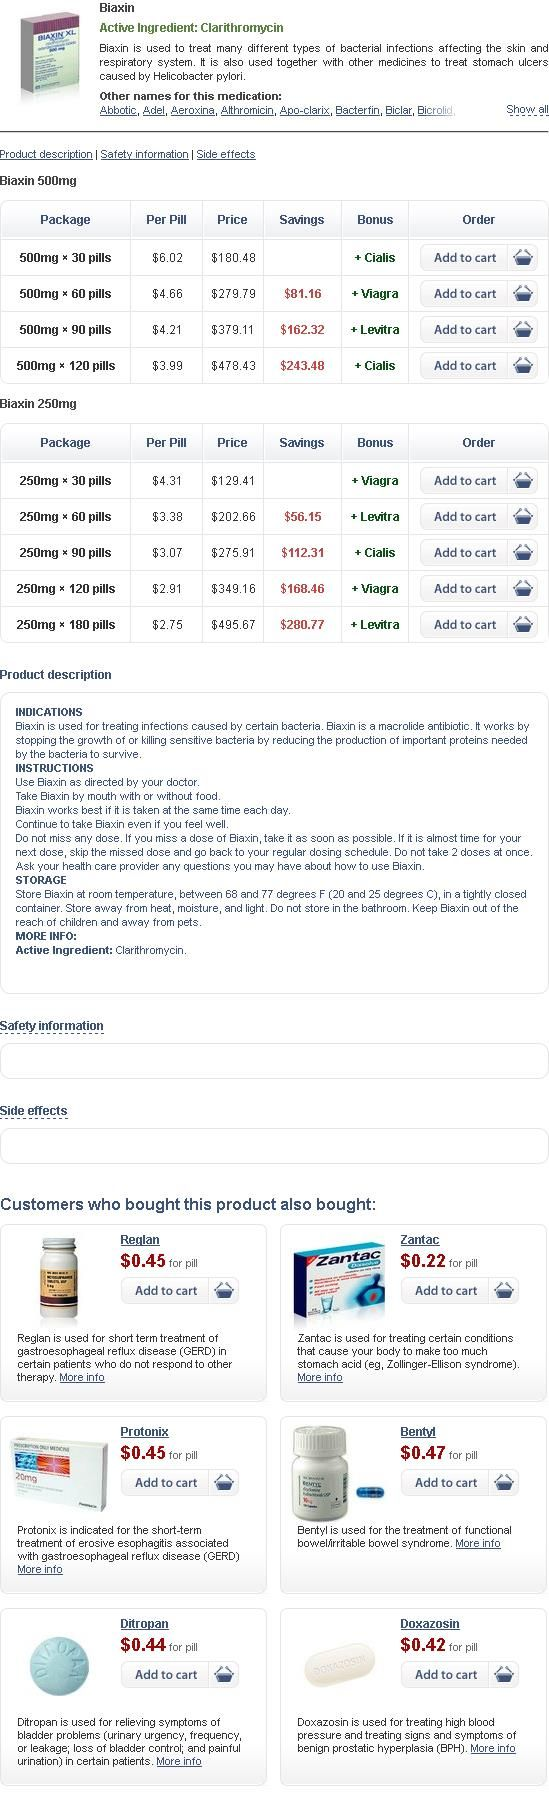 penegra 100 price in pakistan